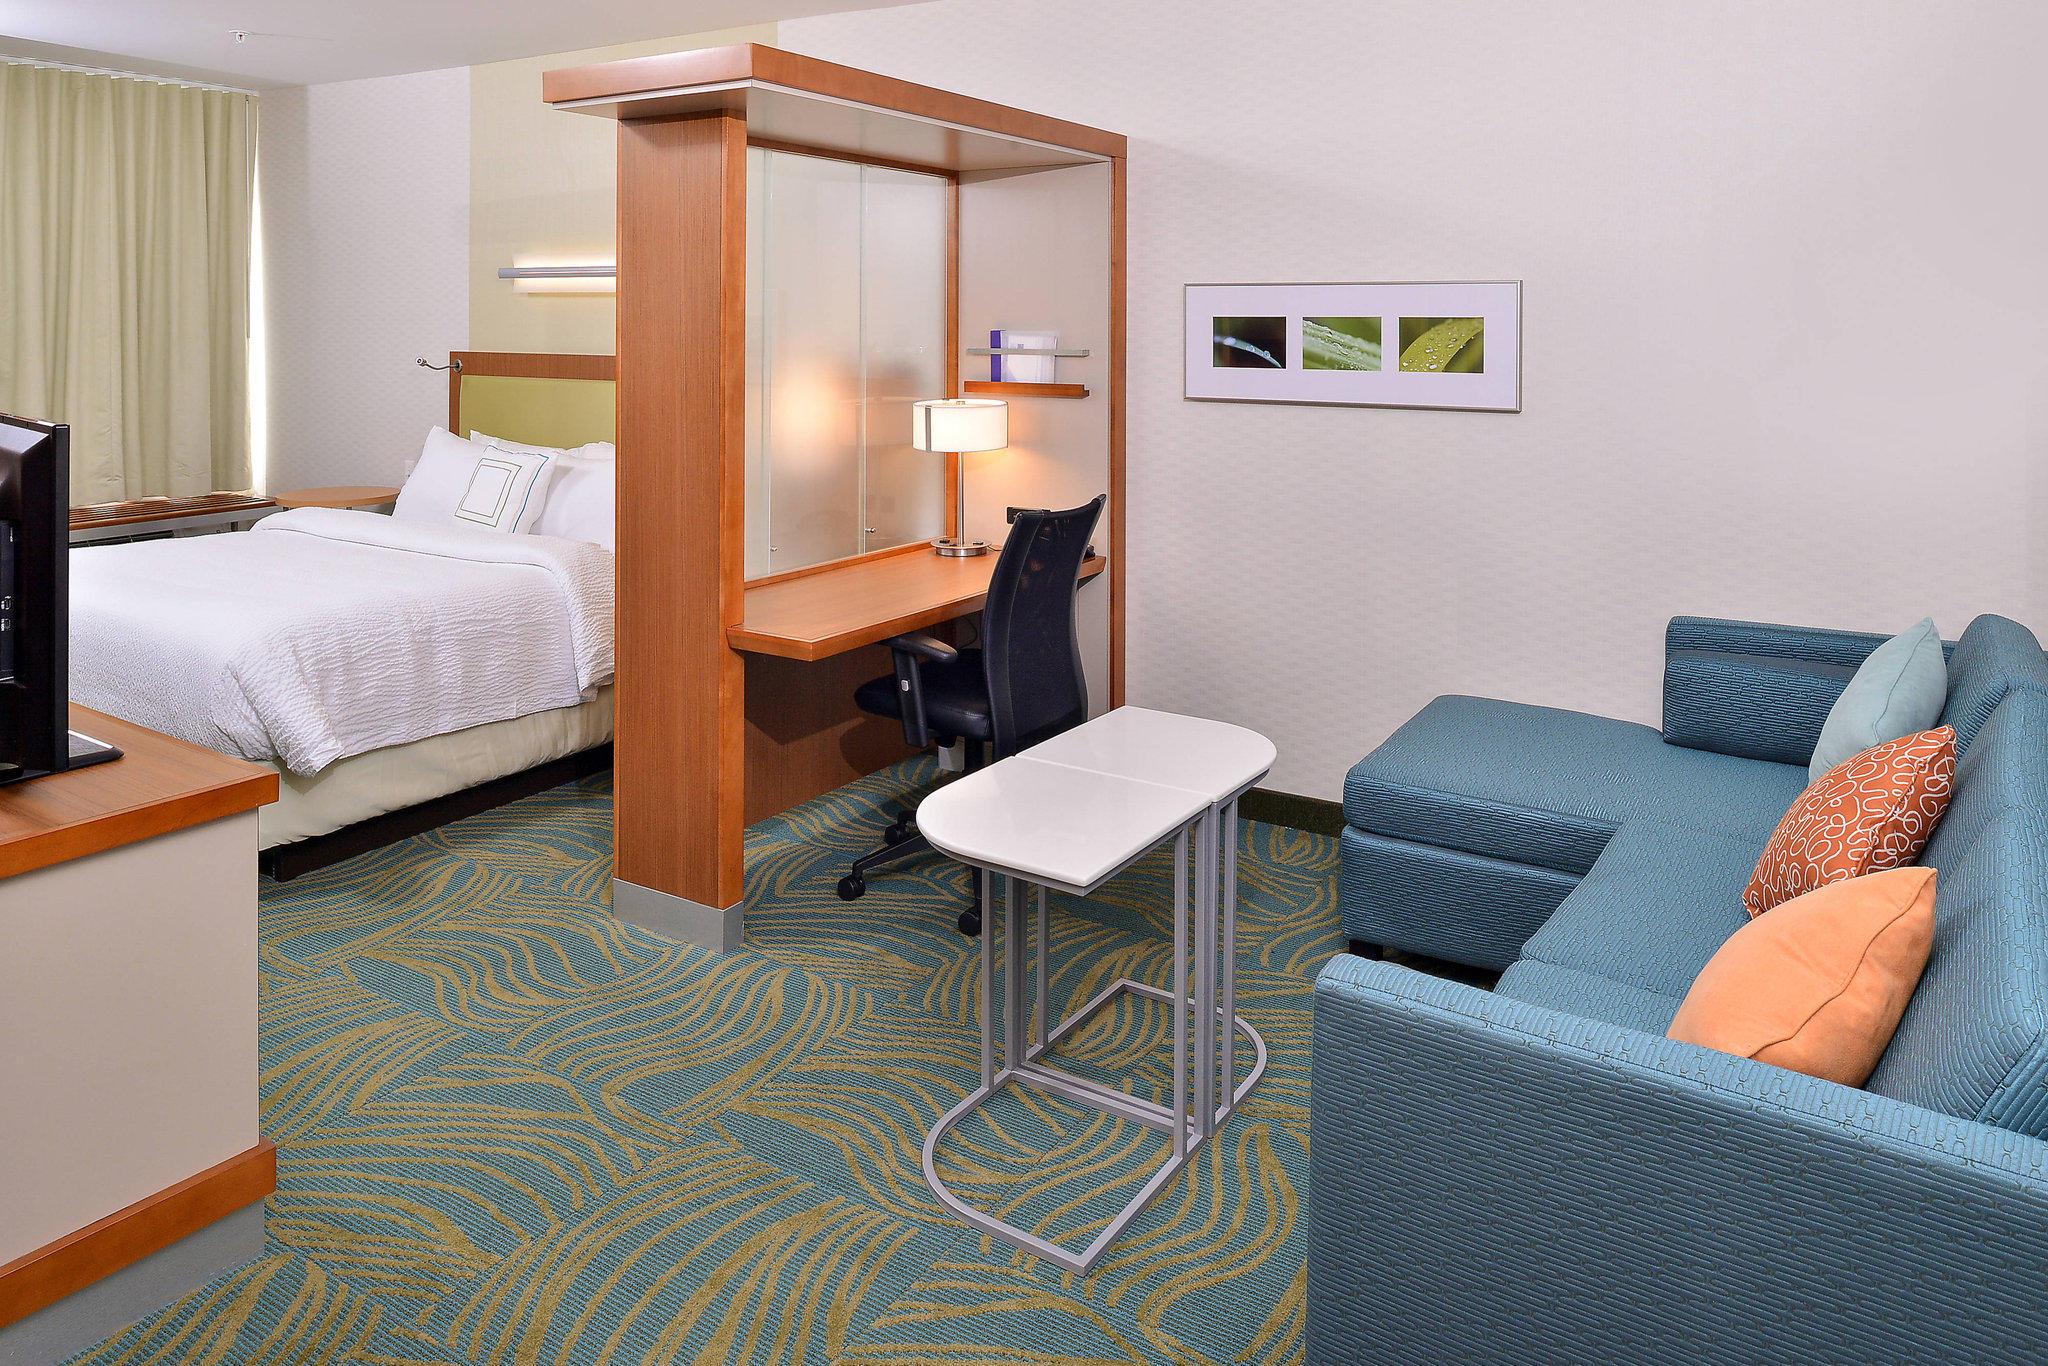 SpringHill Suites by Marriott Voorhees Mt. Laurel/Cherry Hill